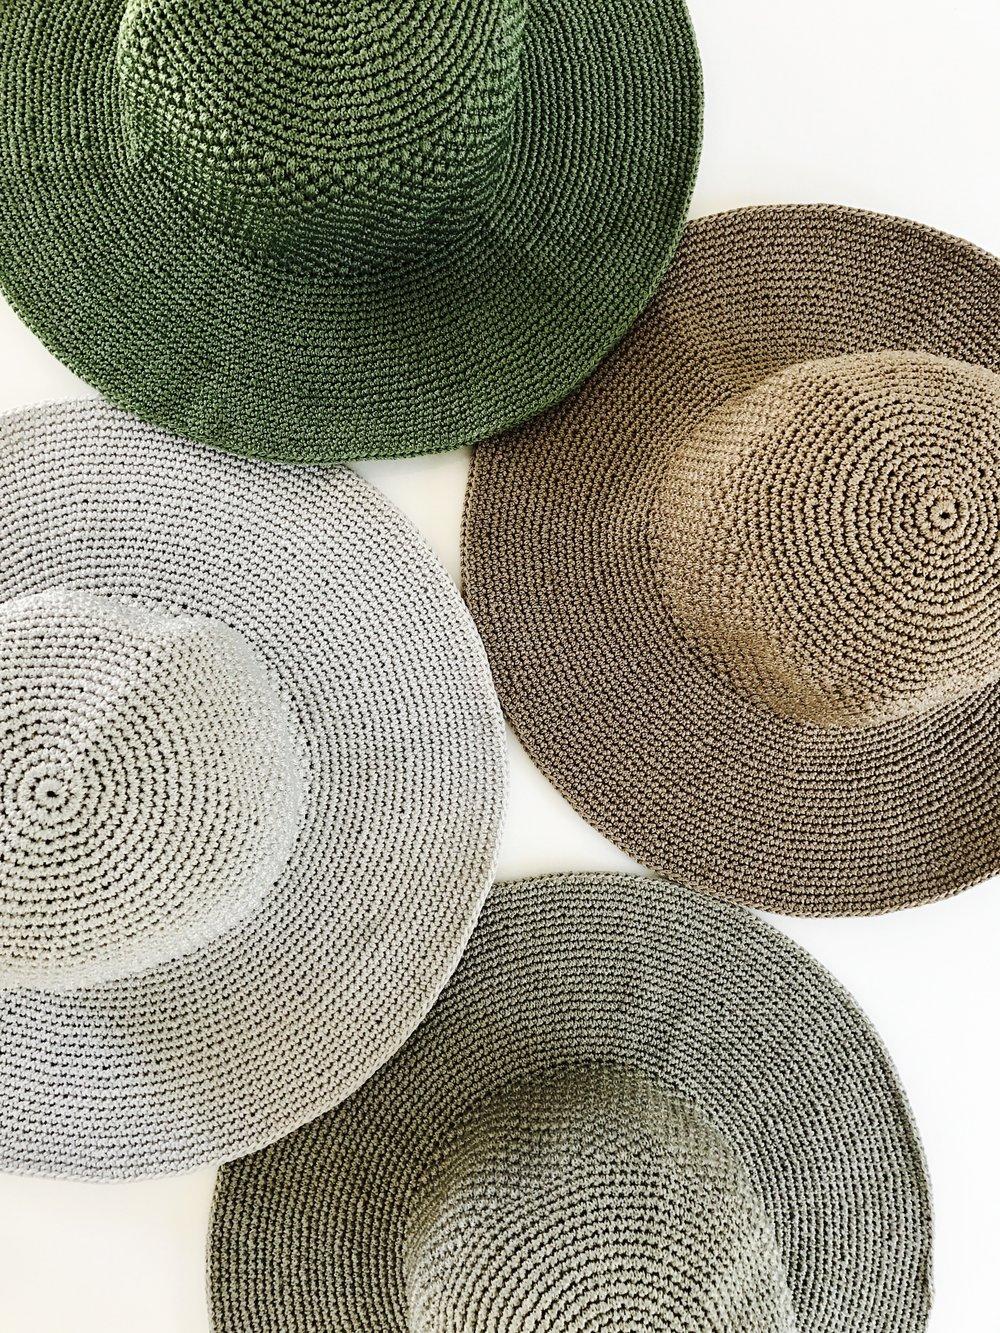 VARIOUS_HATS.jpg